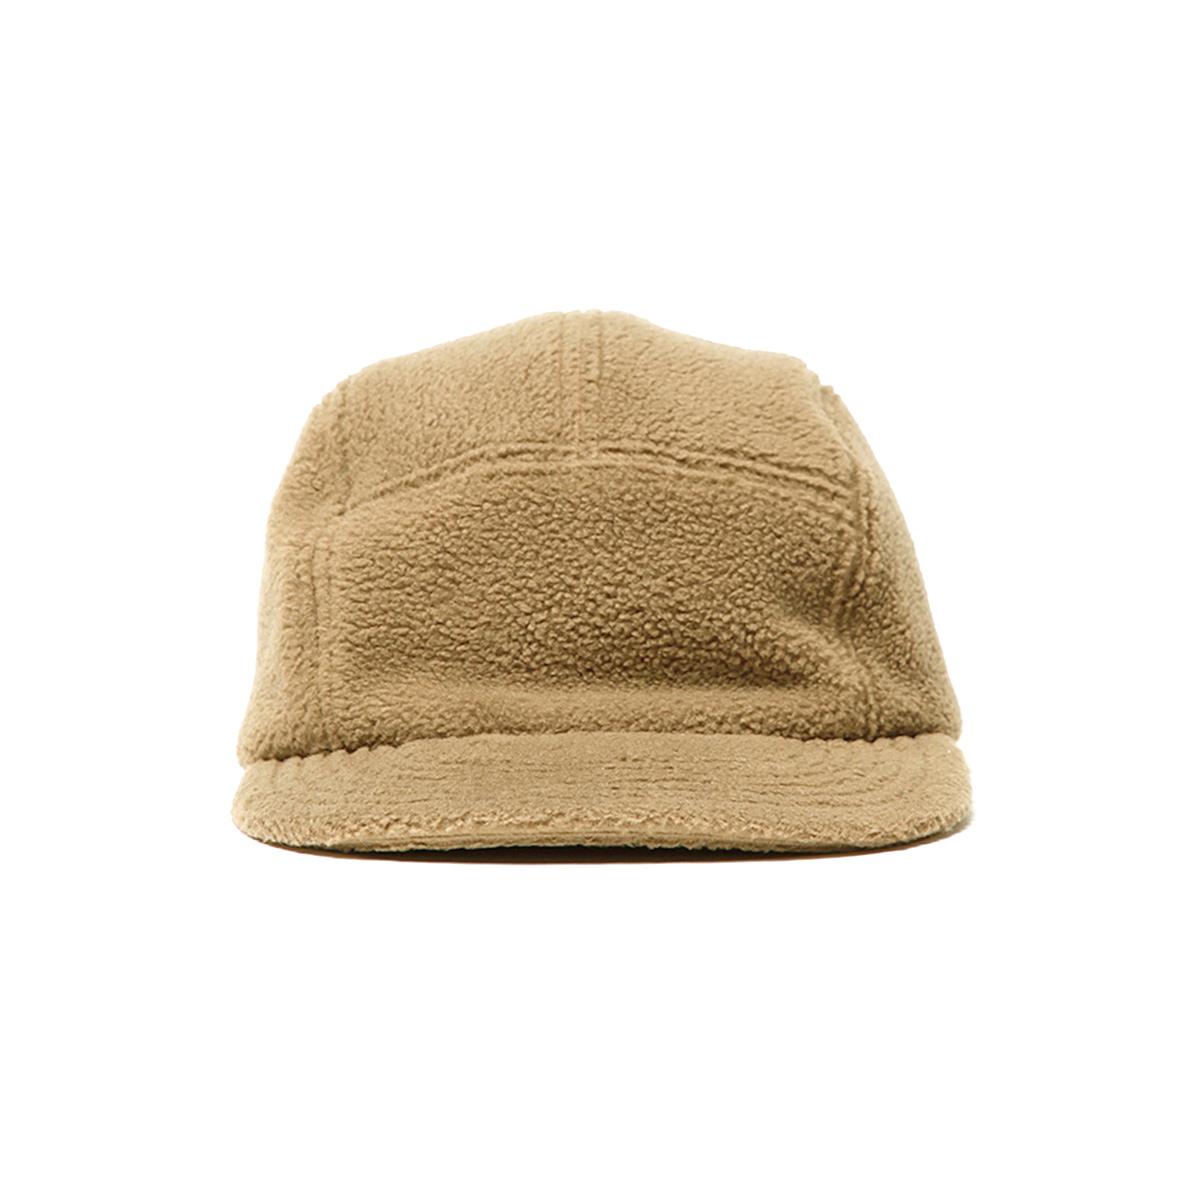 nonnative / DWELLER JET CAP POLY FLEECE POLARTEC -BEIGE